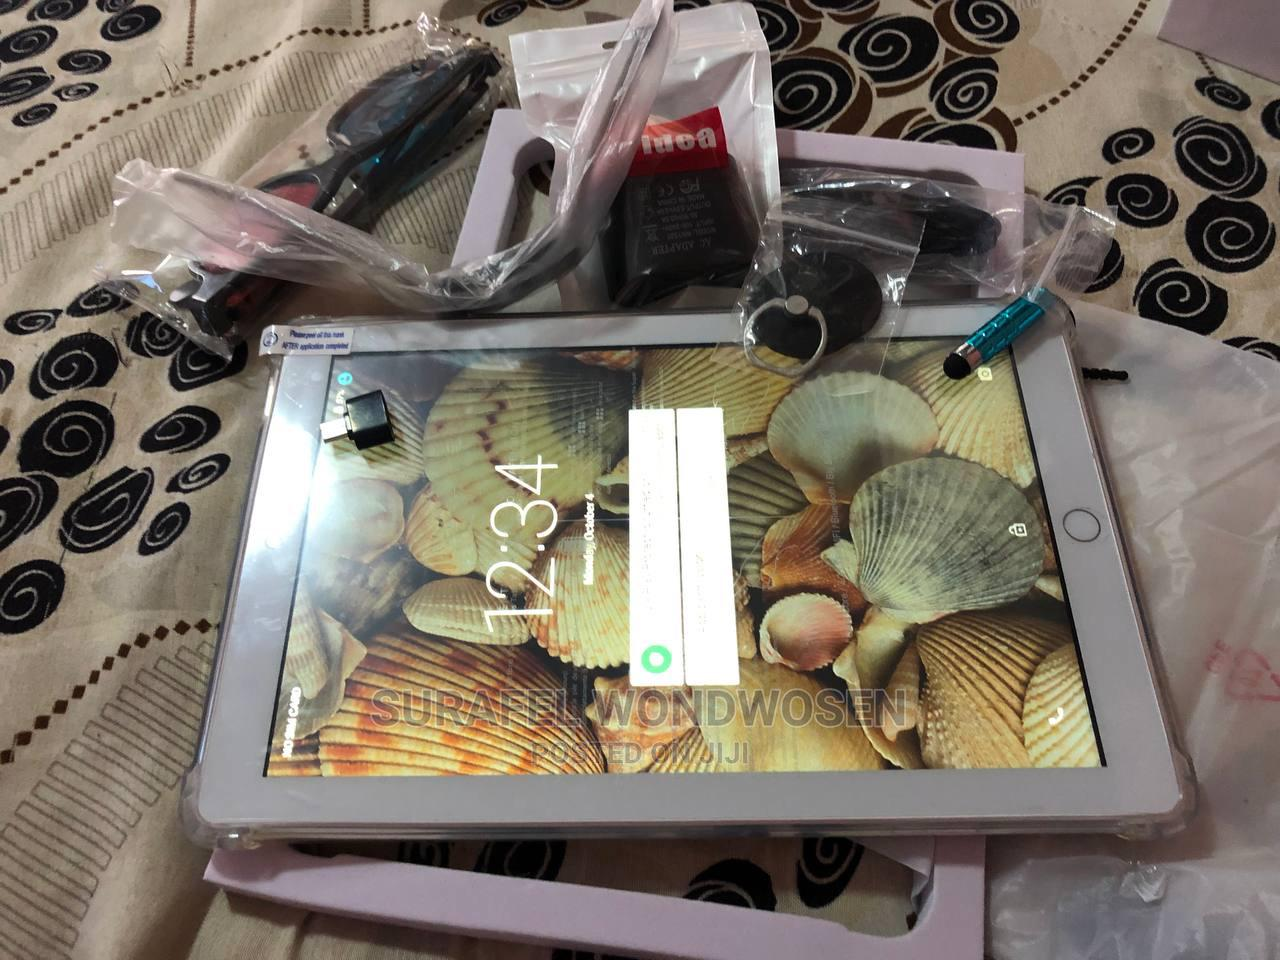 New C Idea CM2000+ 64 GB | Tablets for sale in Addis Ketema, Addis Ababa, Ethiopia